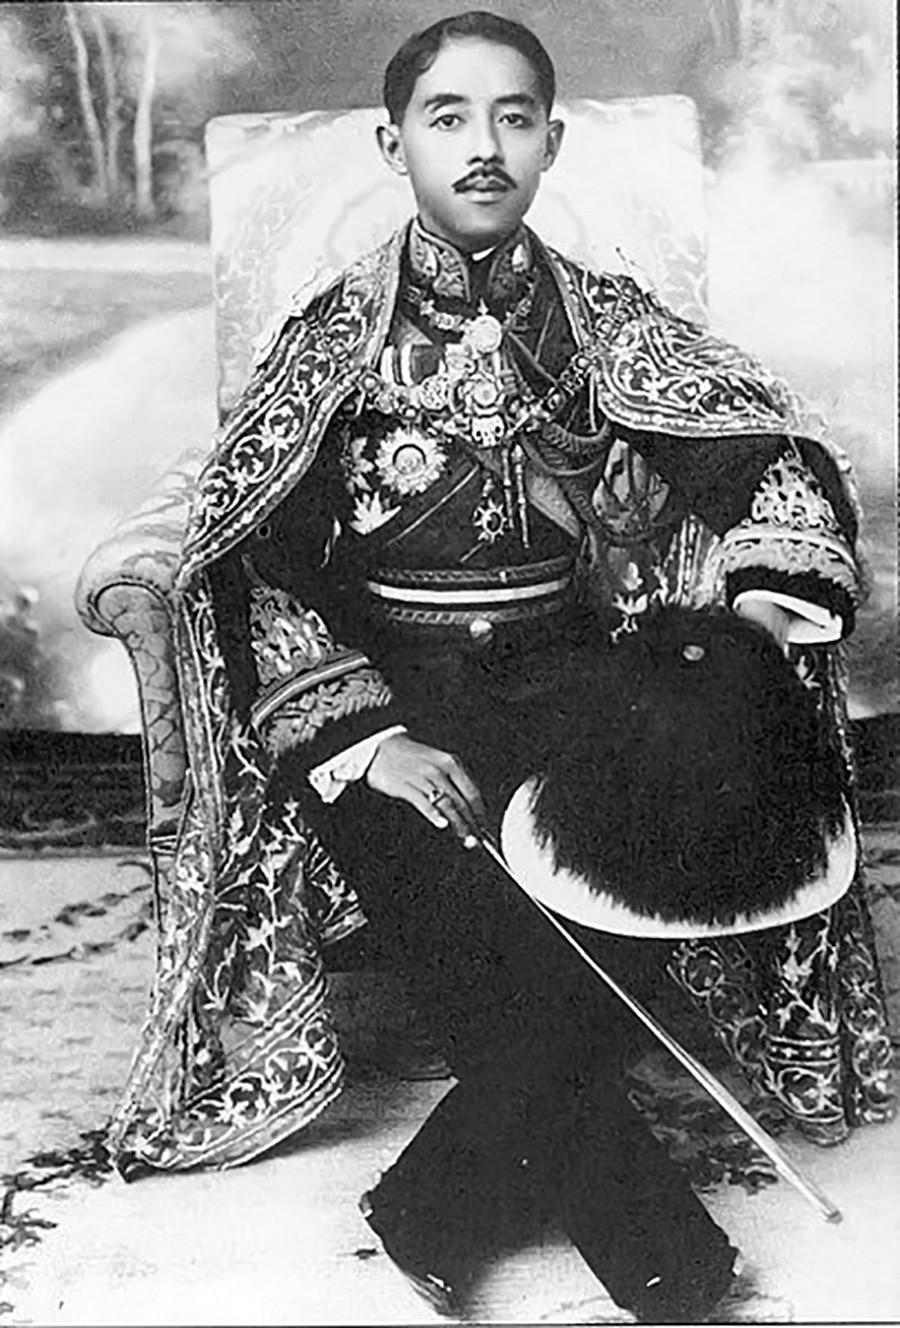 El príncipe Chakrabongse Bhuvanadh